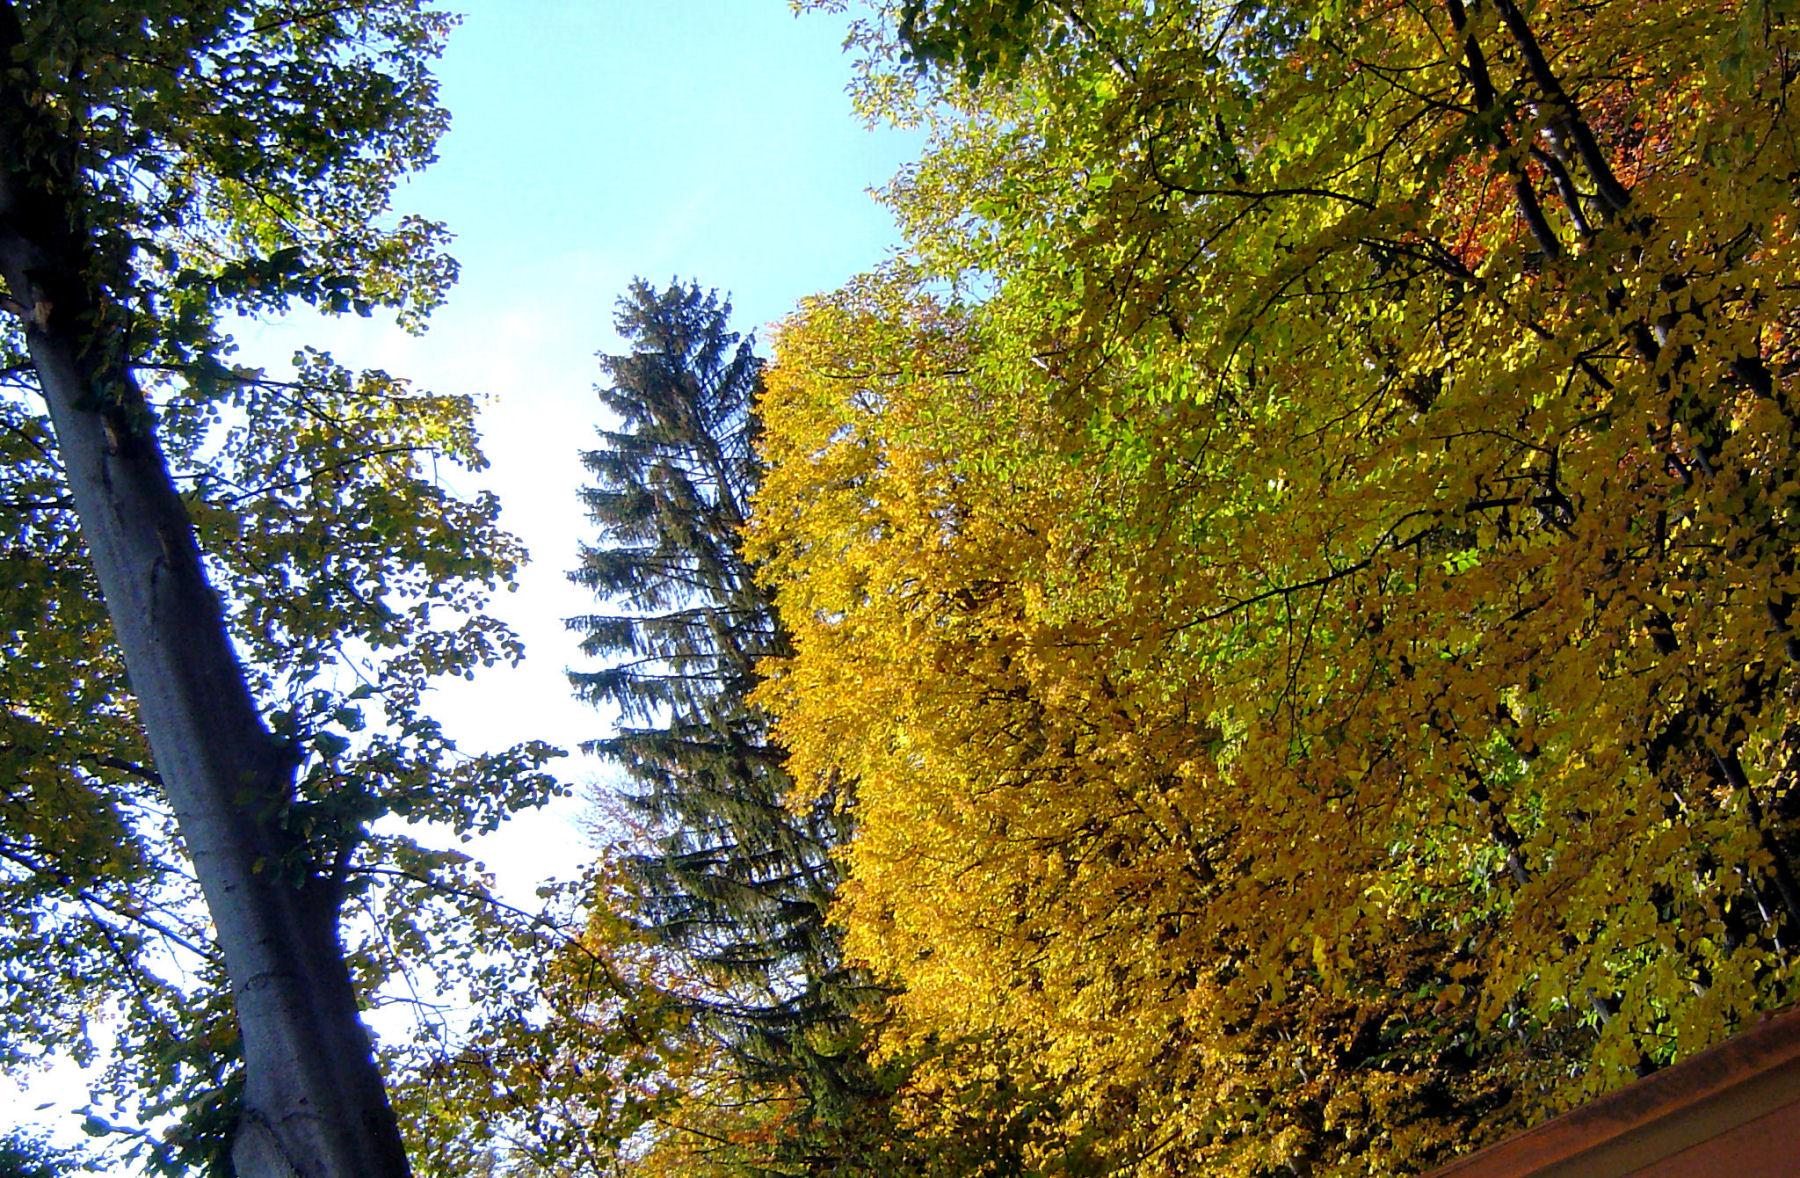 autumn-nature-slovenia-015-2